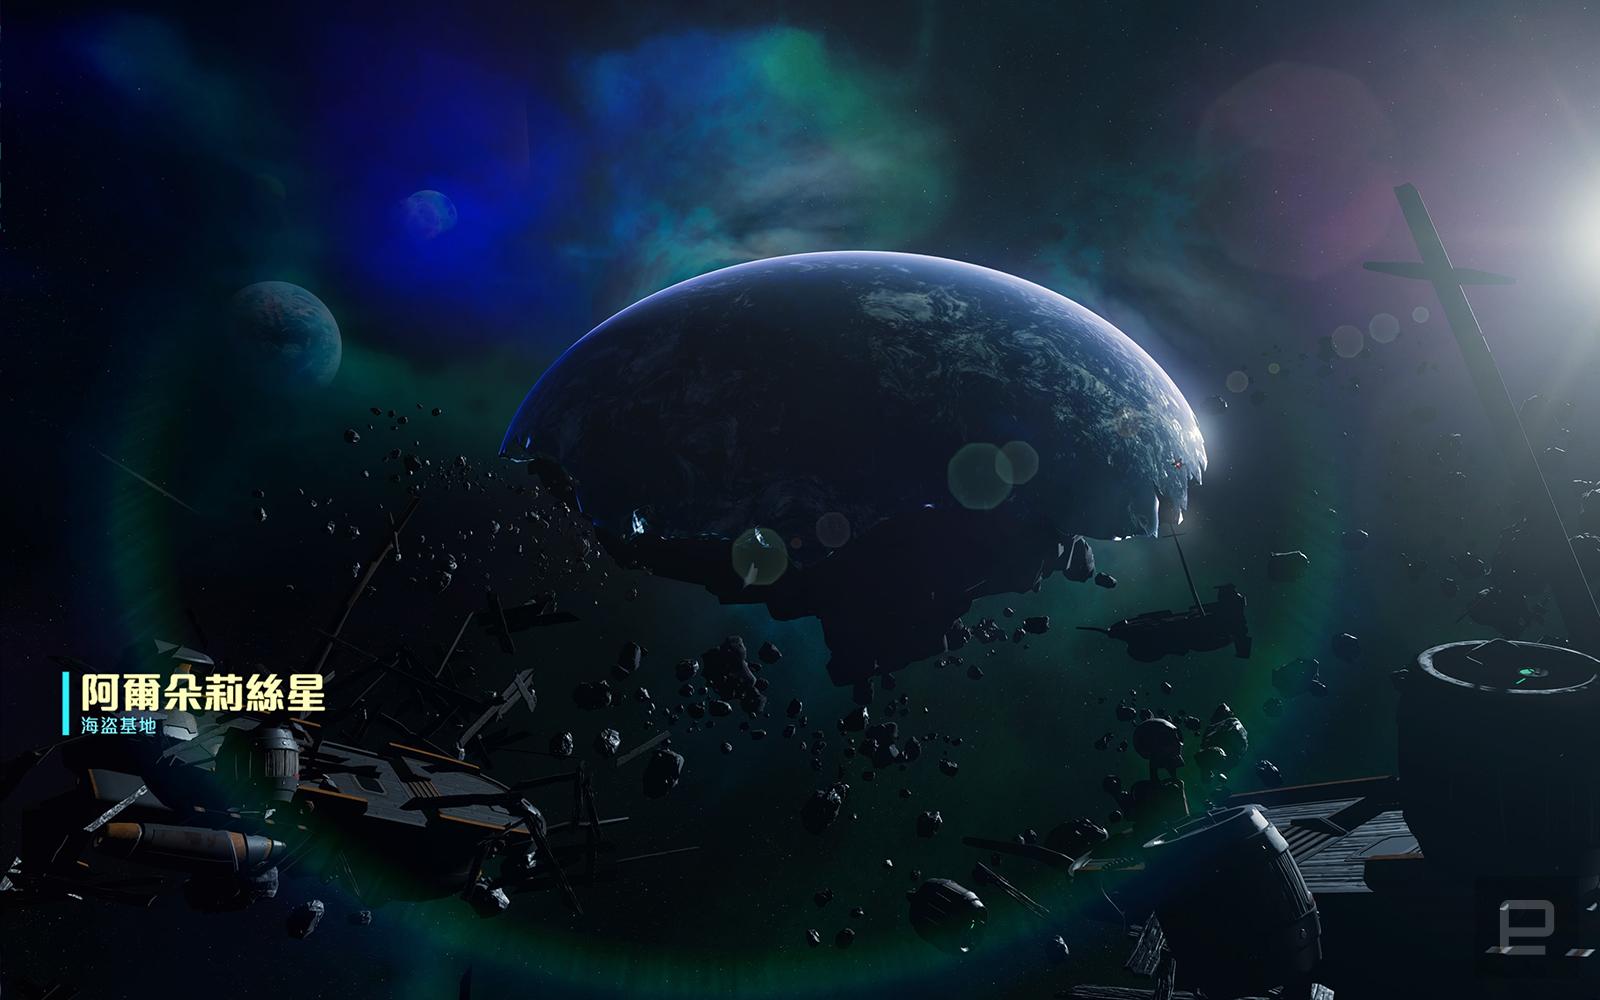 Ratchet & Clank Rift Apart Planet 8